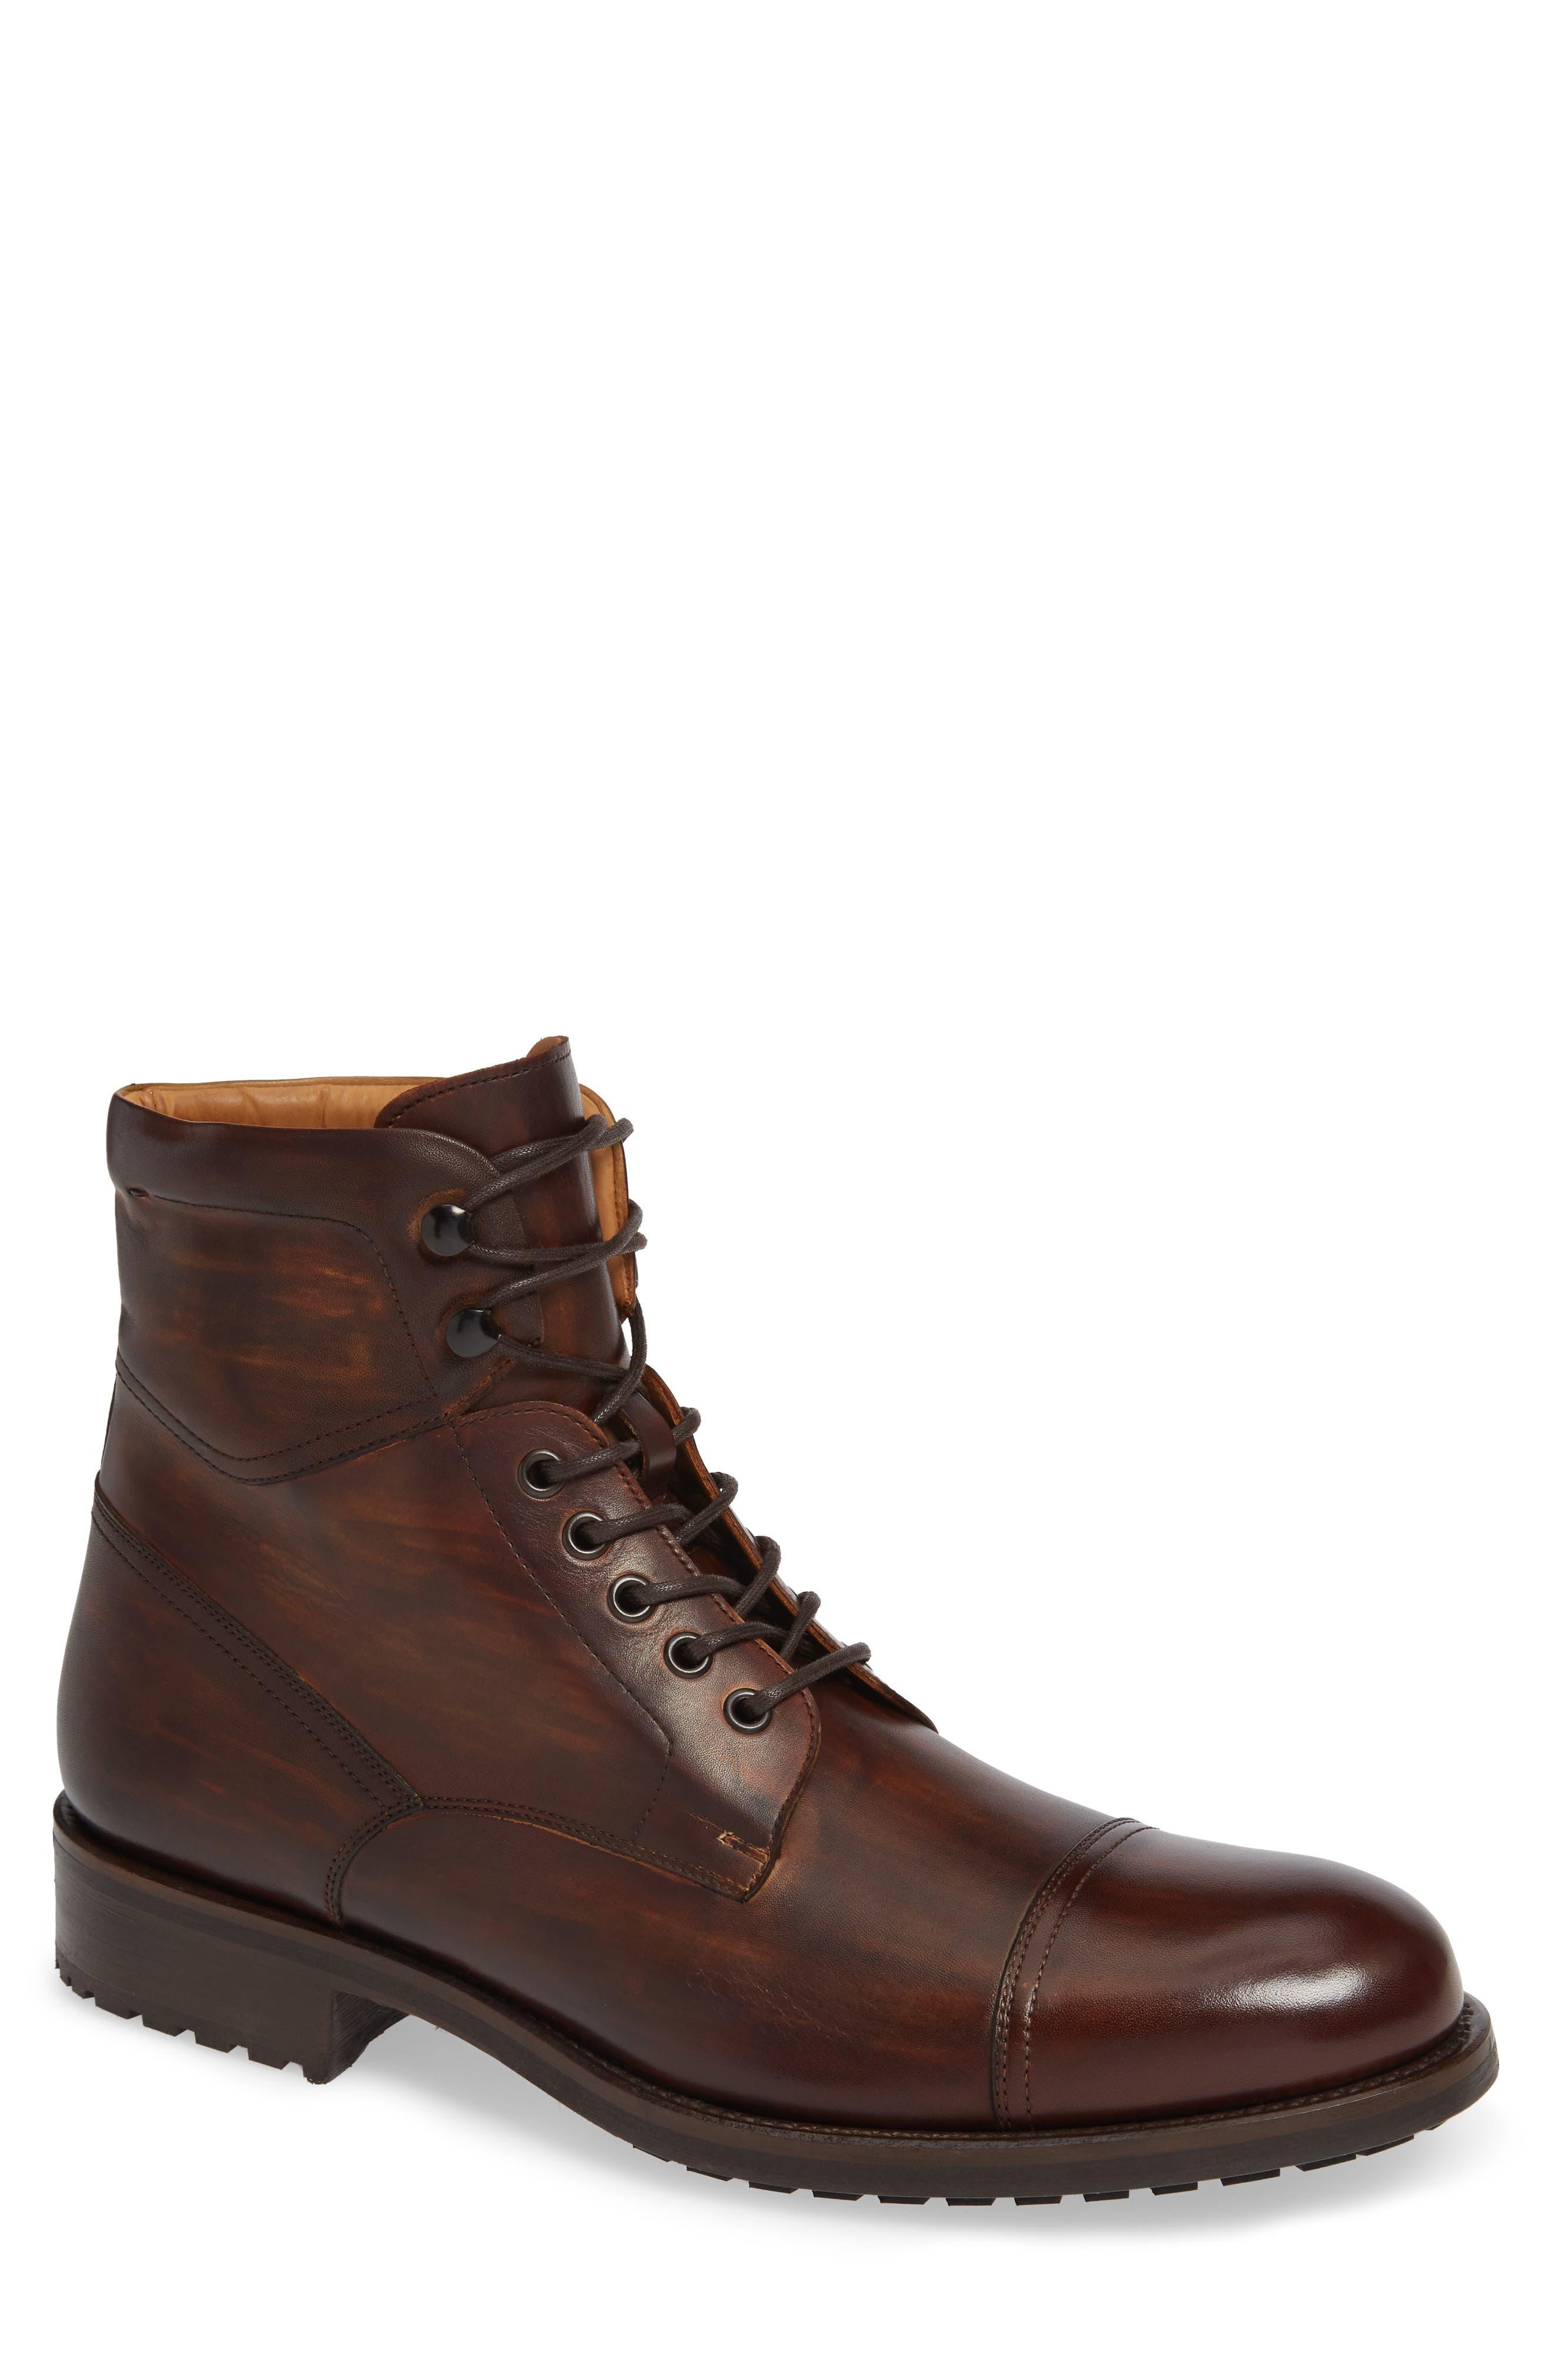 Magnanni Peyton Cap Toe Boot, Brown